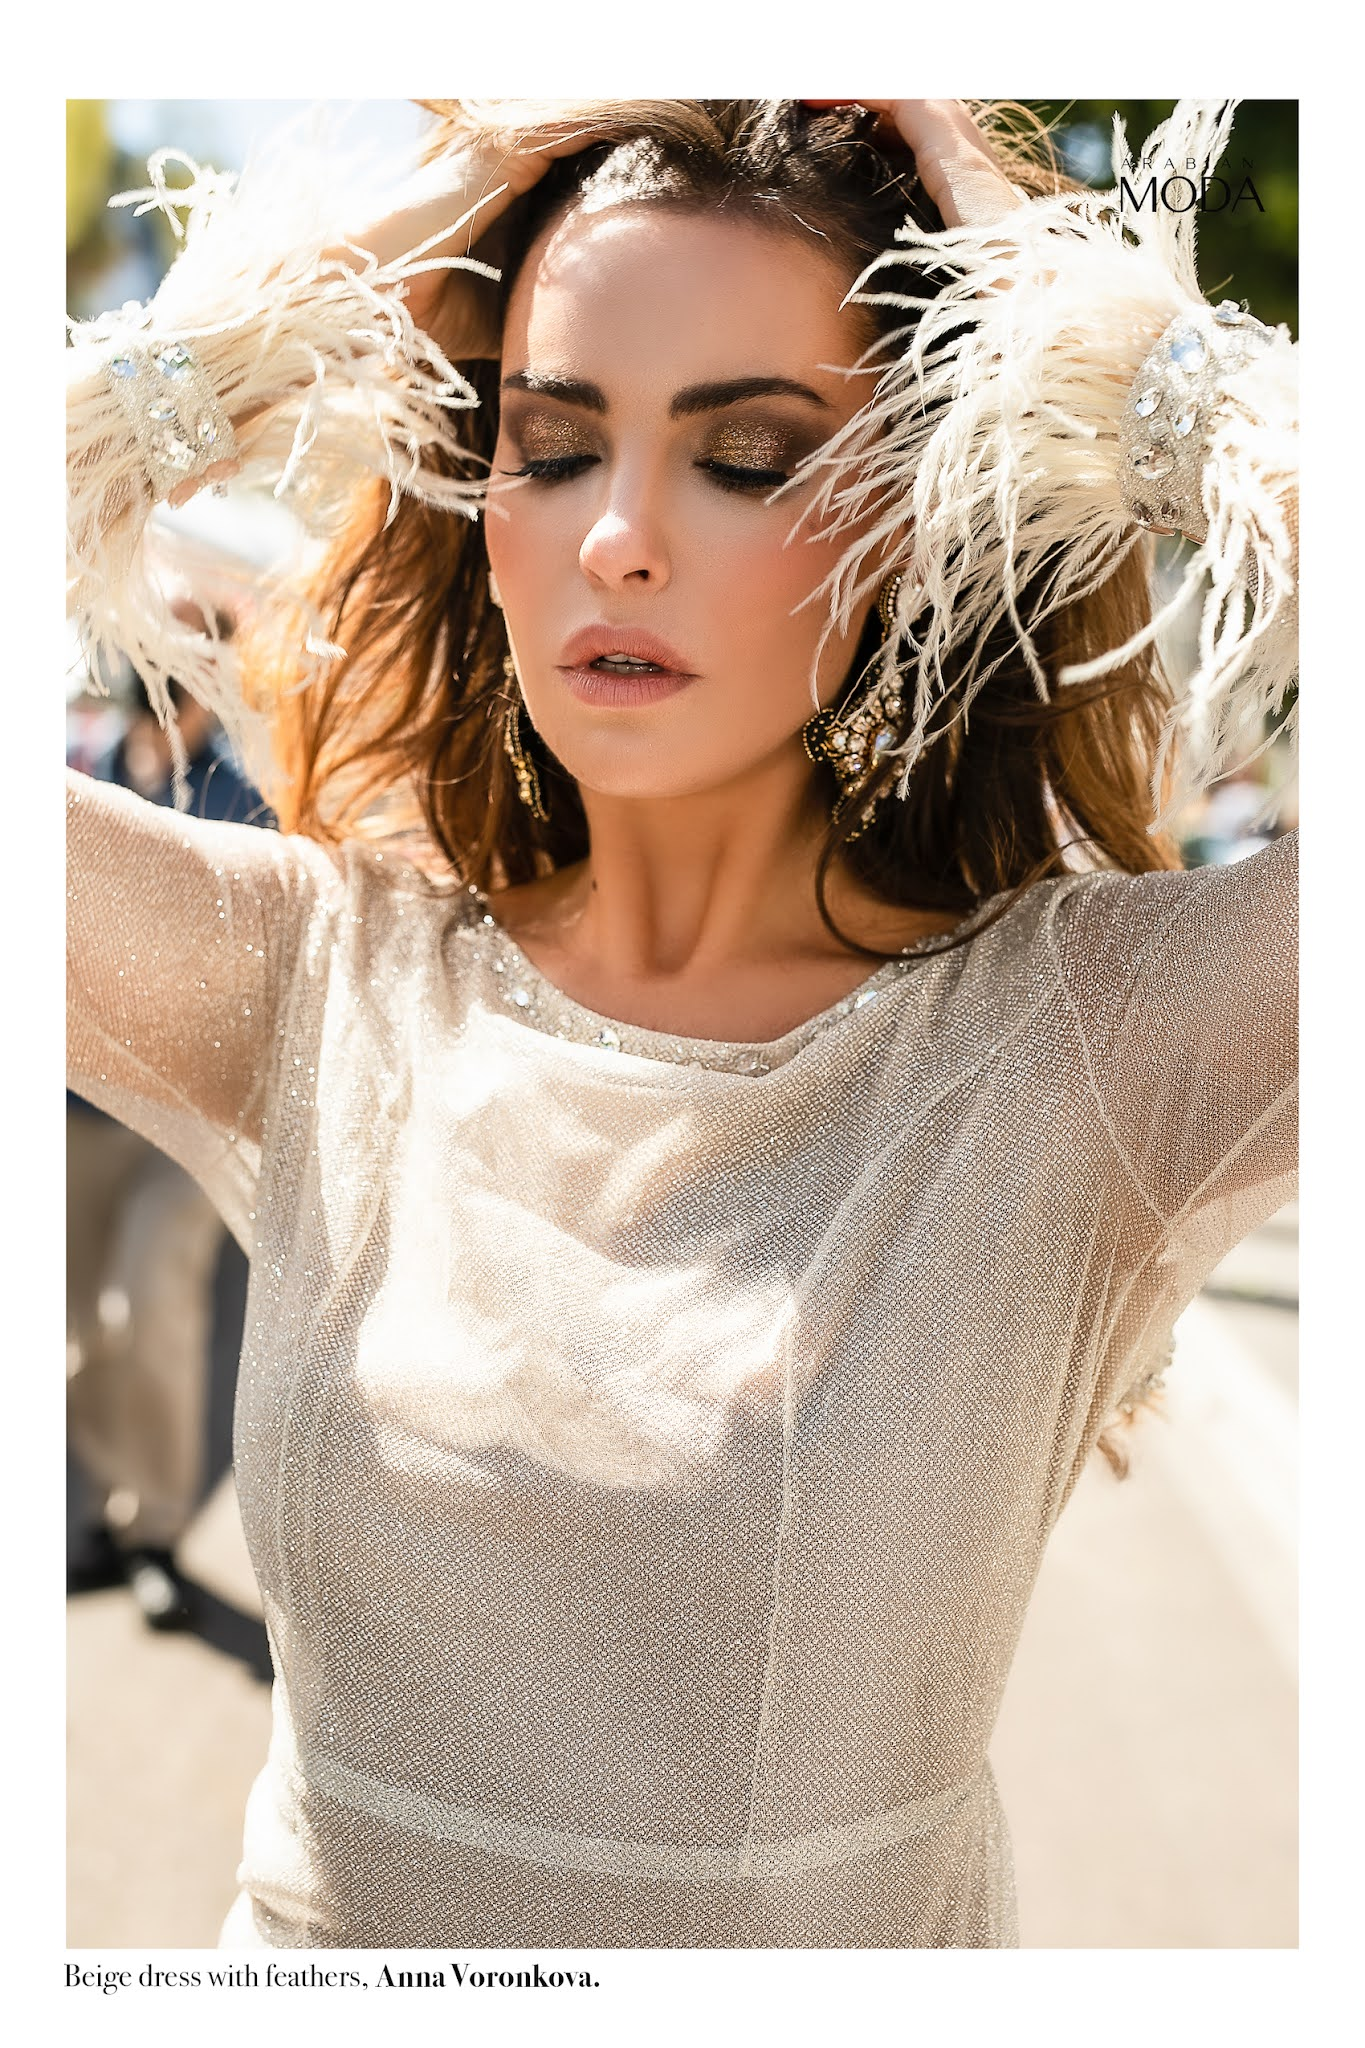 Arabian Moda x Anna Voronkova